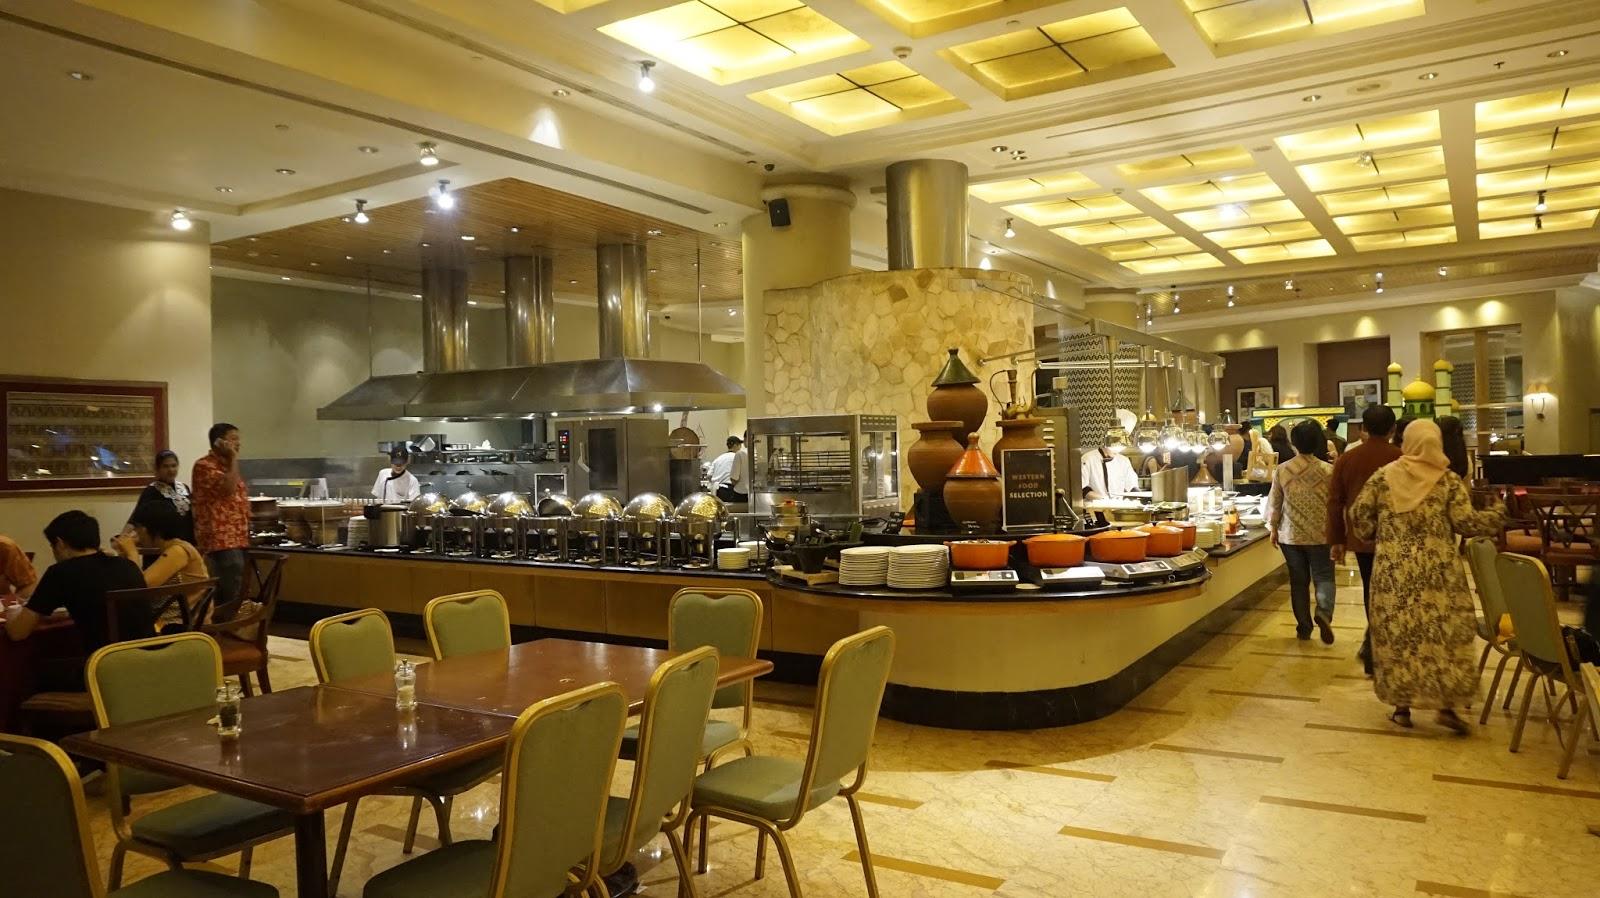 Astrid Amalia Sailendra Restaurant And Cakebox Deli At Jw Marriott Hotel Jakarta